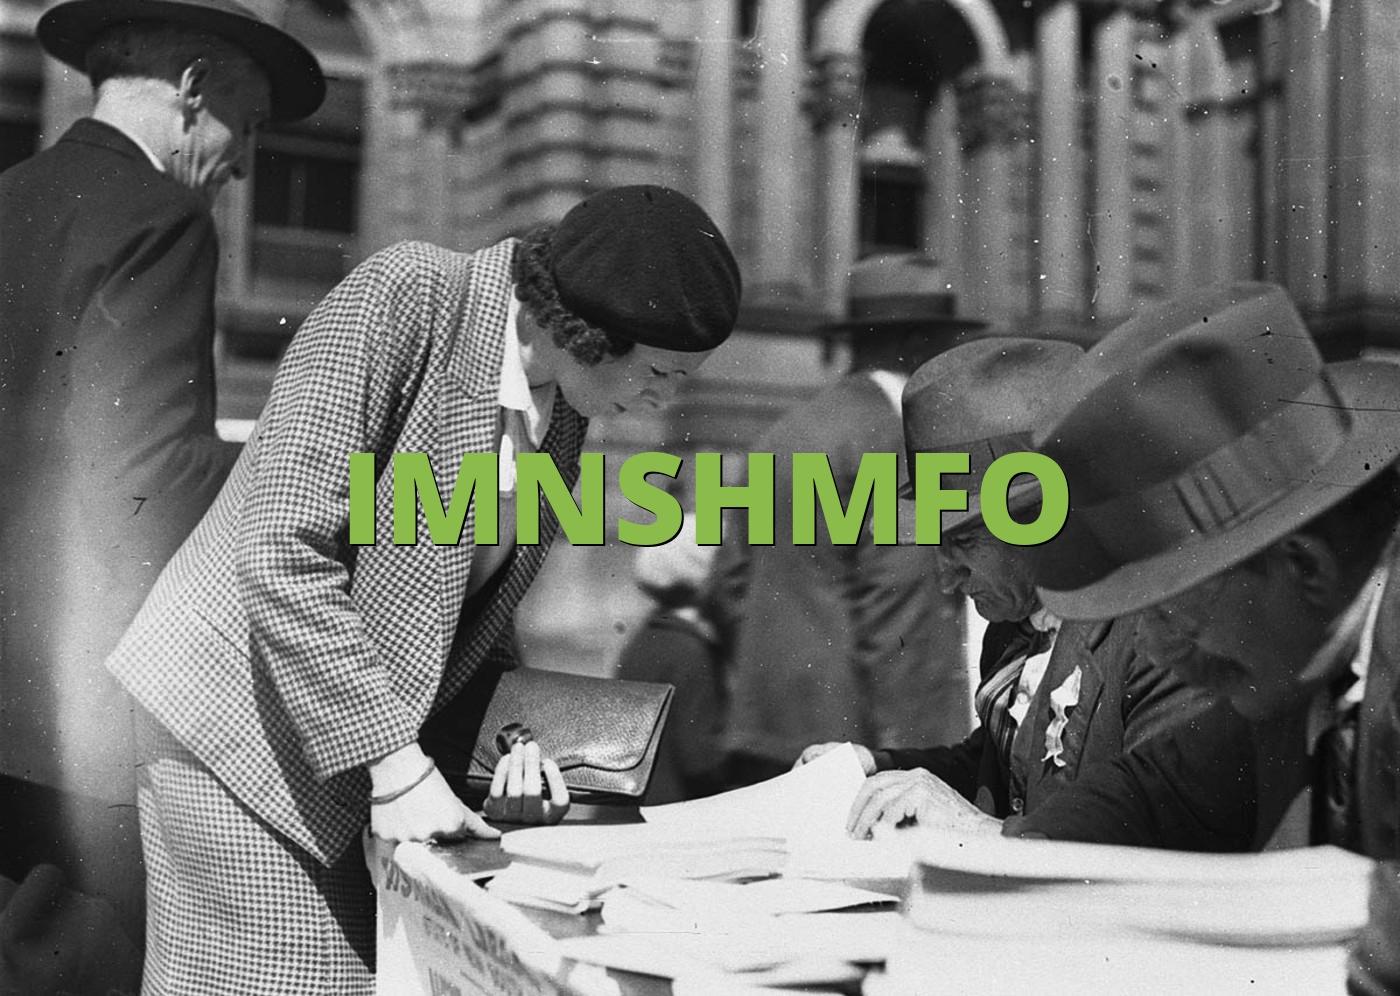 IMNSHMFO